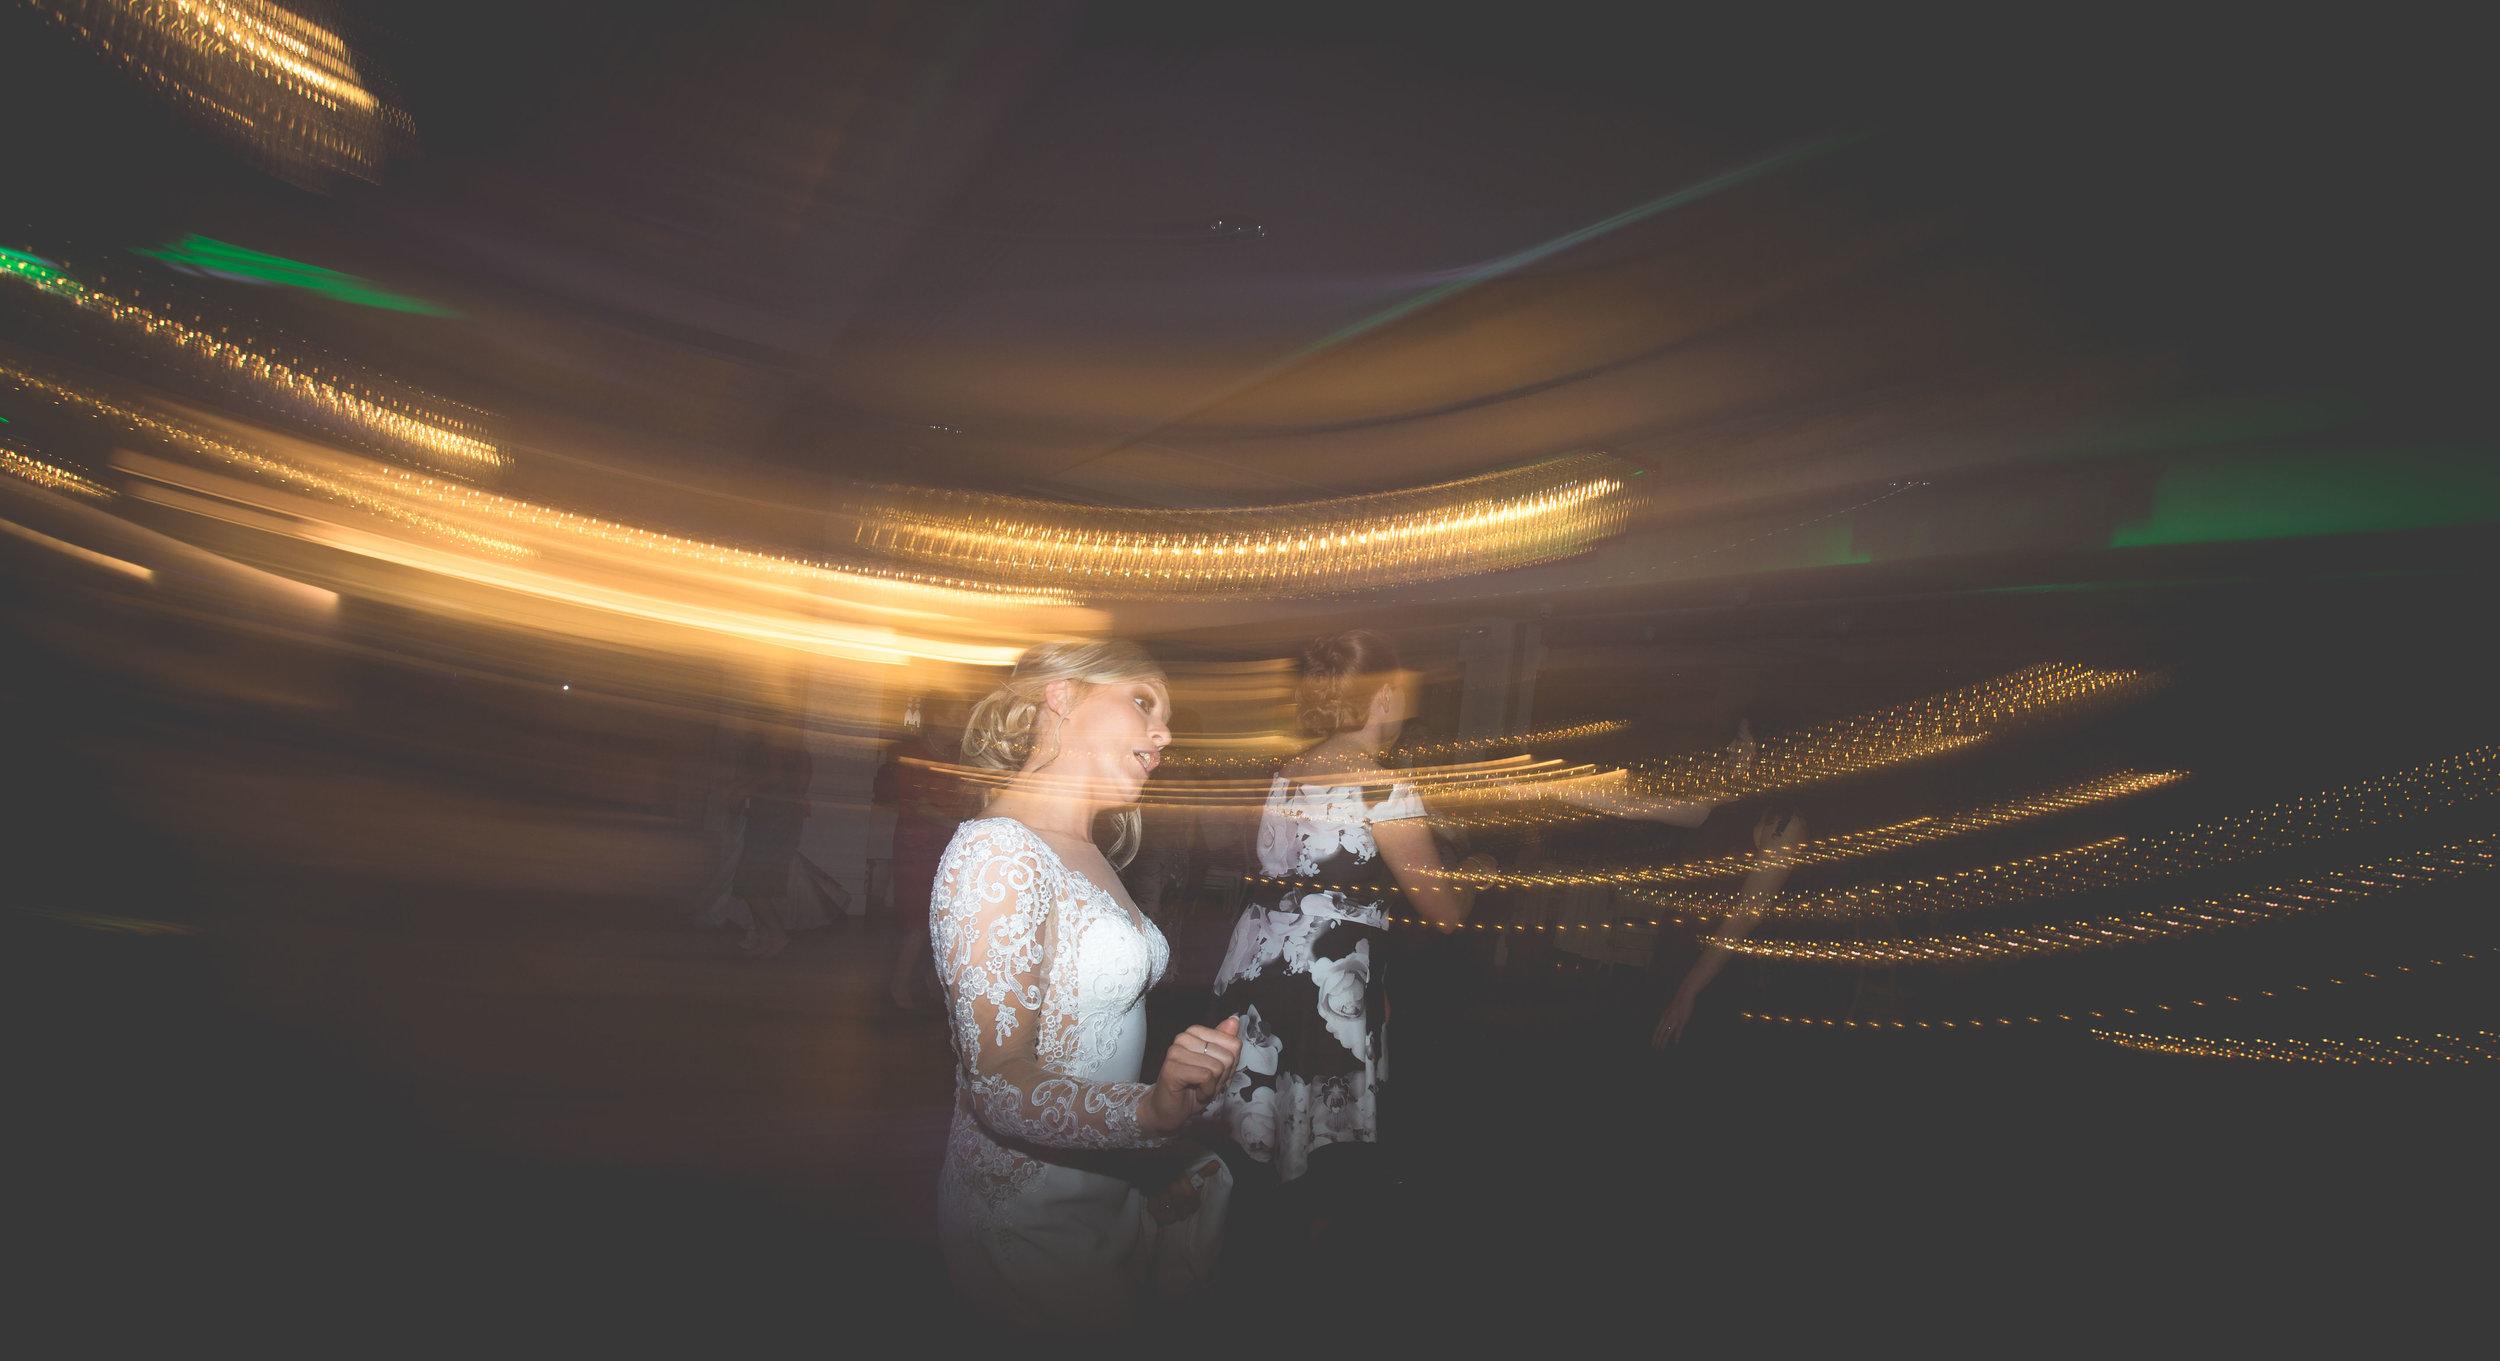 MaryJo_Conor_Mageean_Dancing-29.jpg